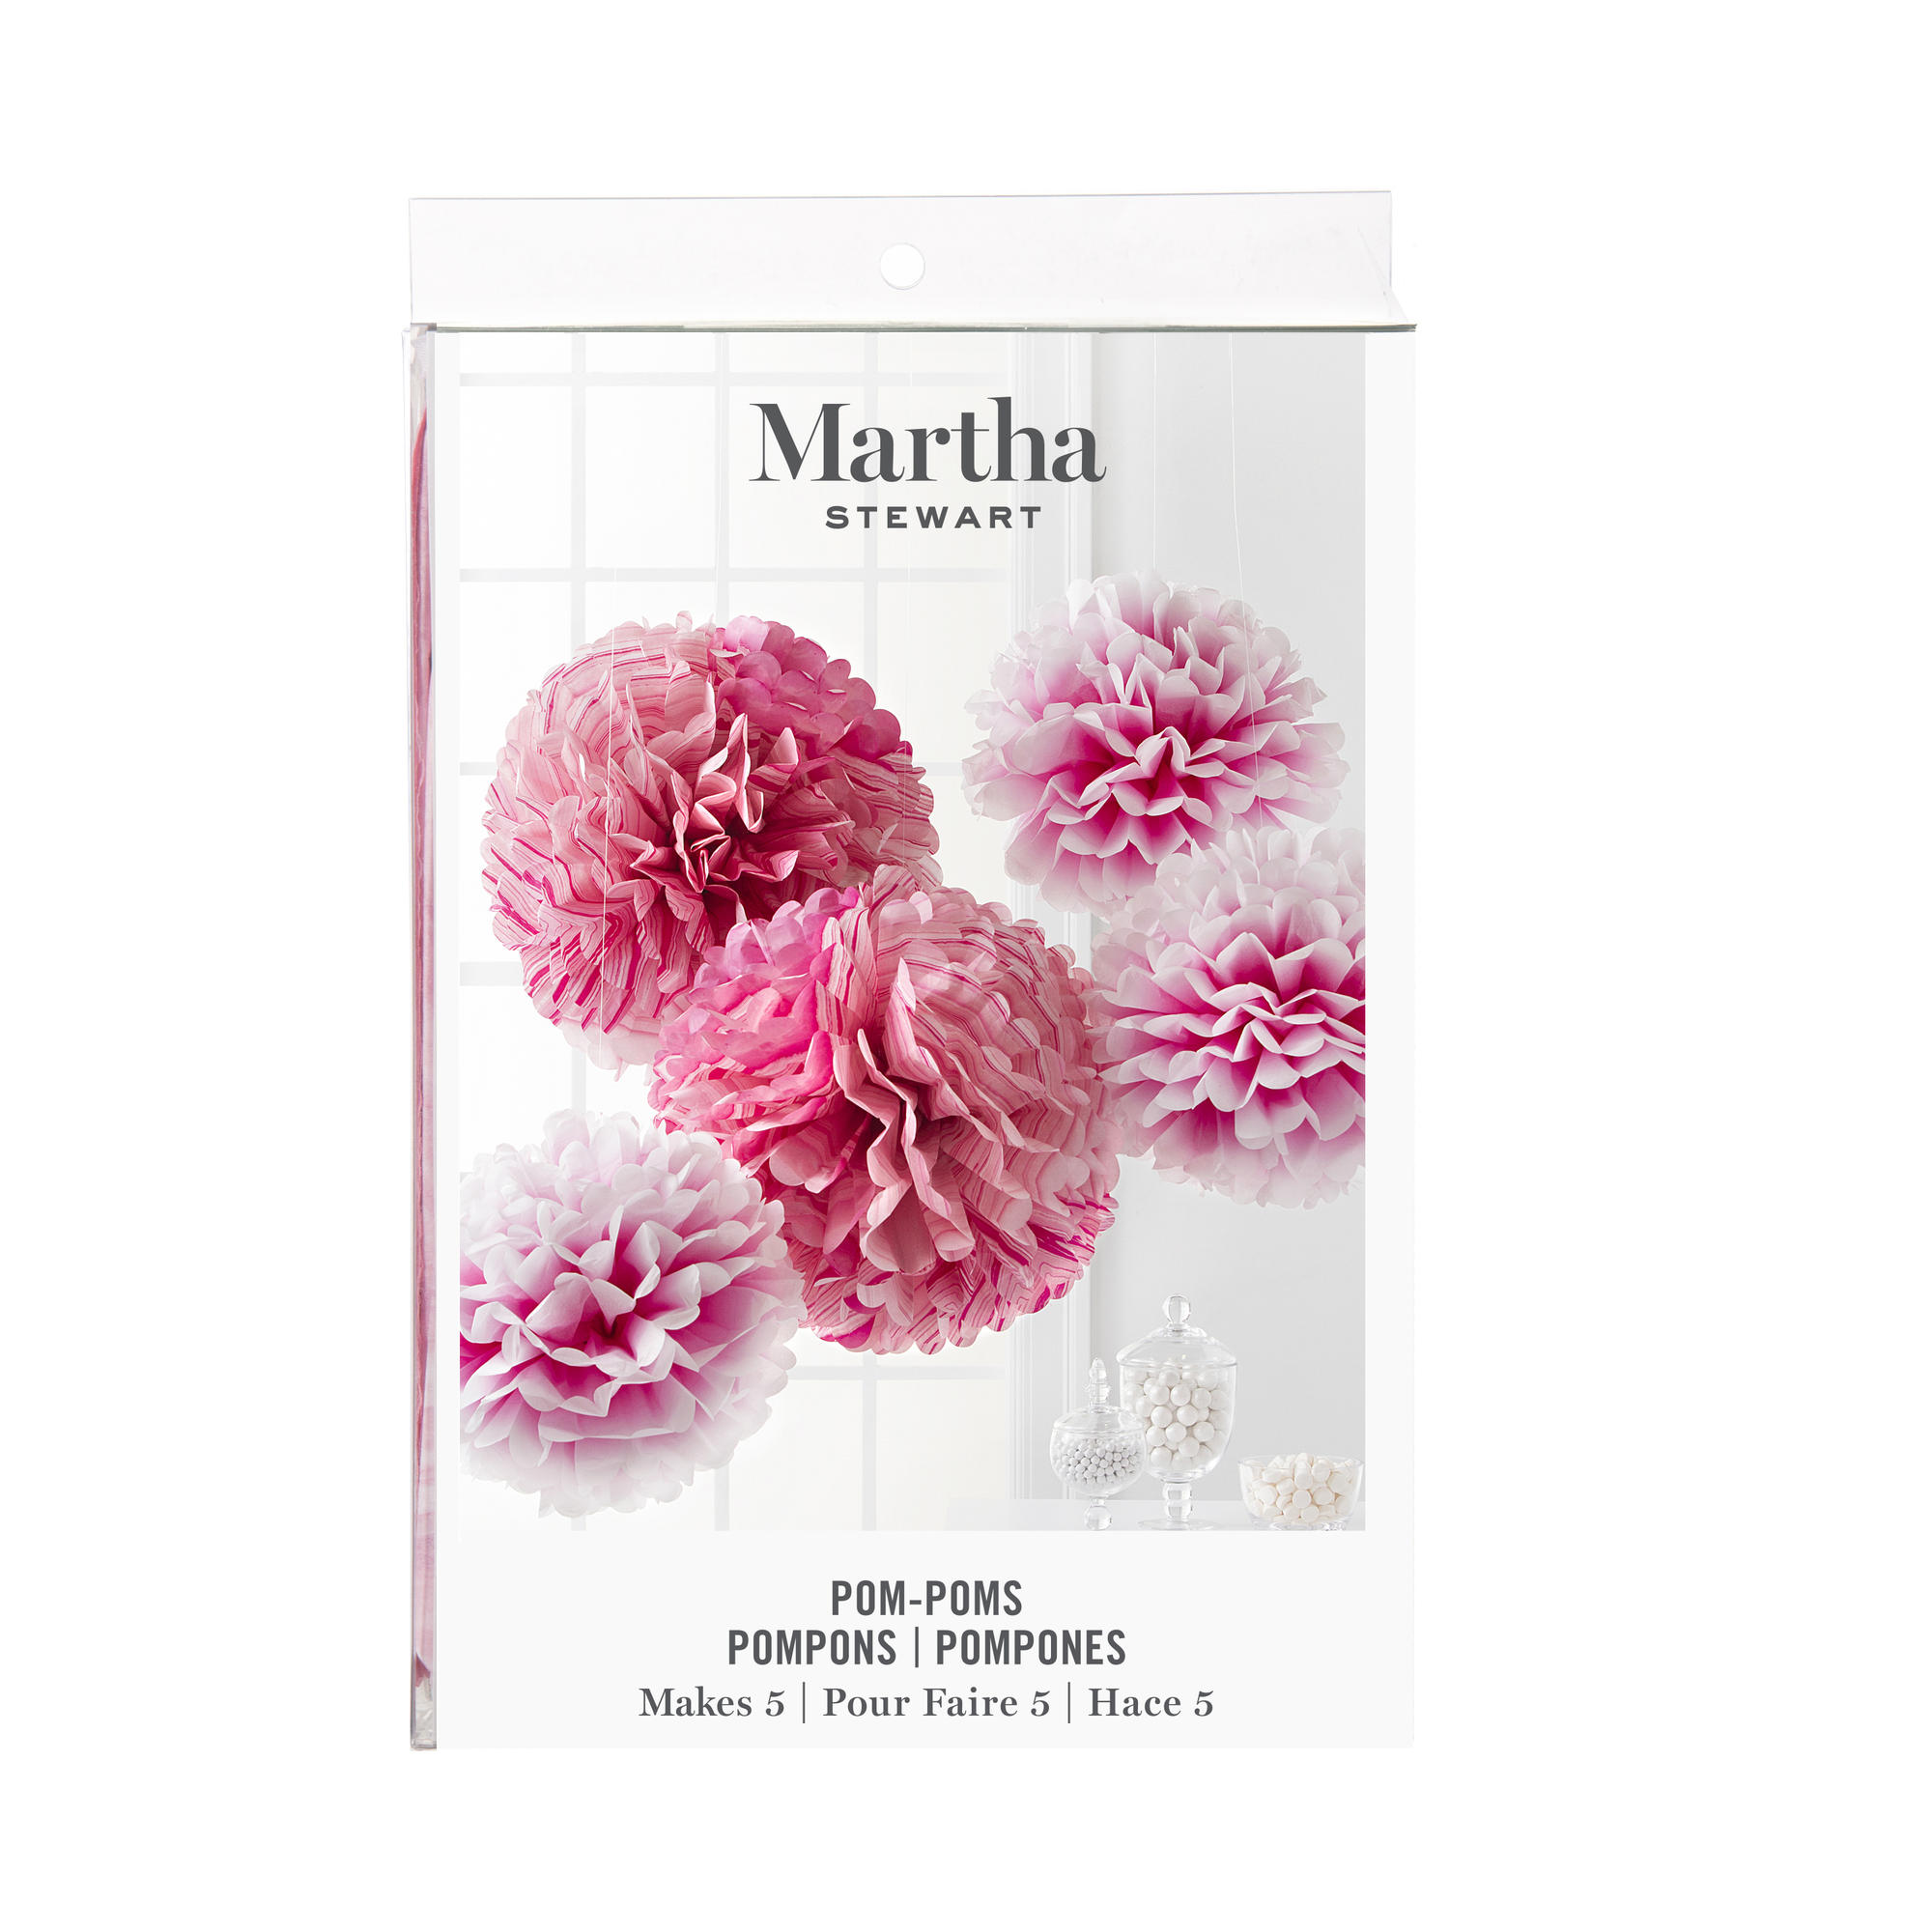 Martha Stewart Poinsettia Tissue Paper Flower Kit Flowers Healthy